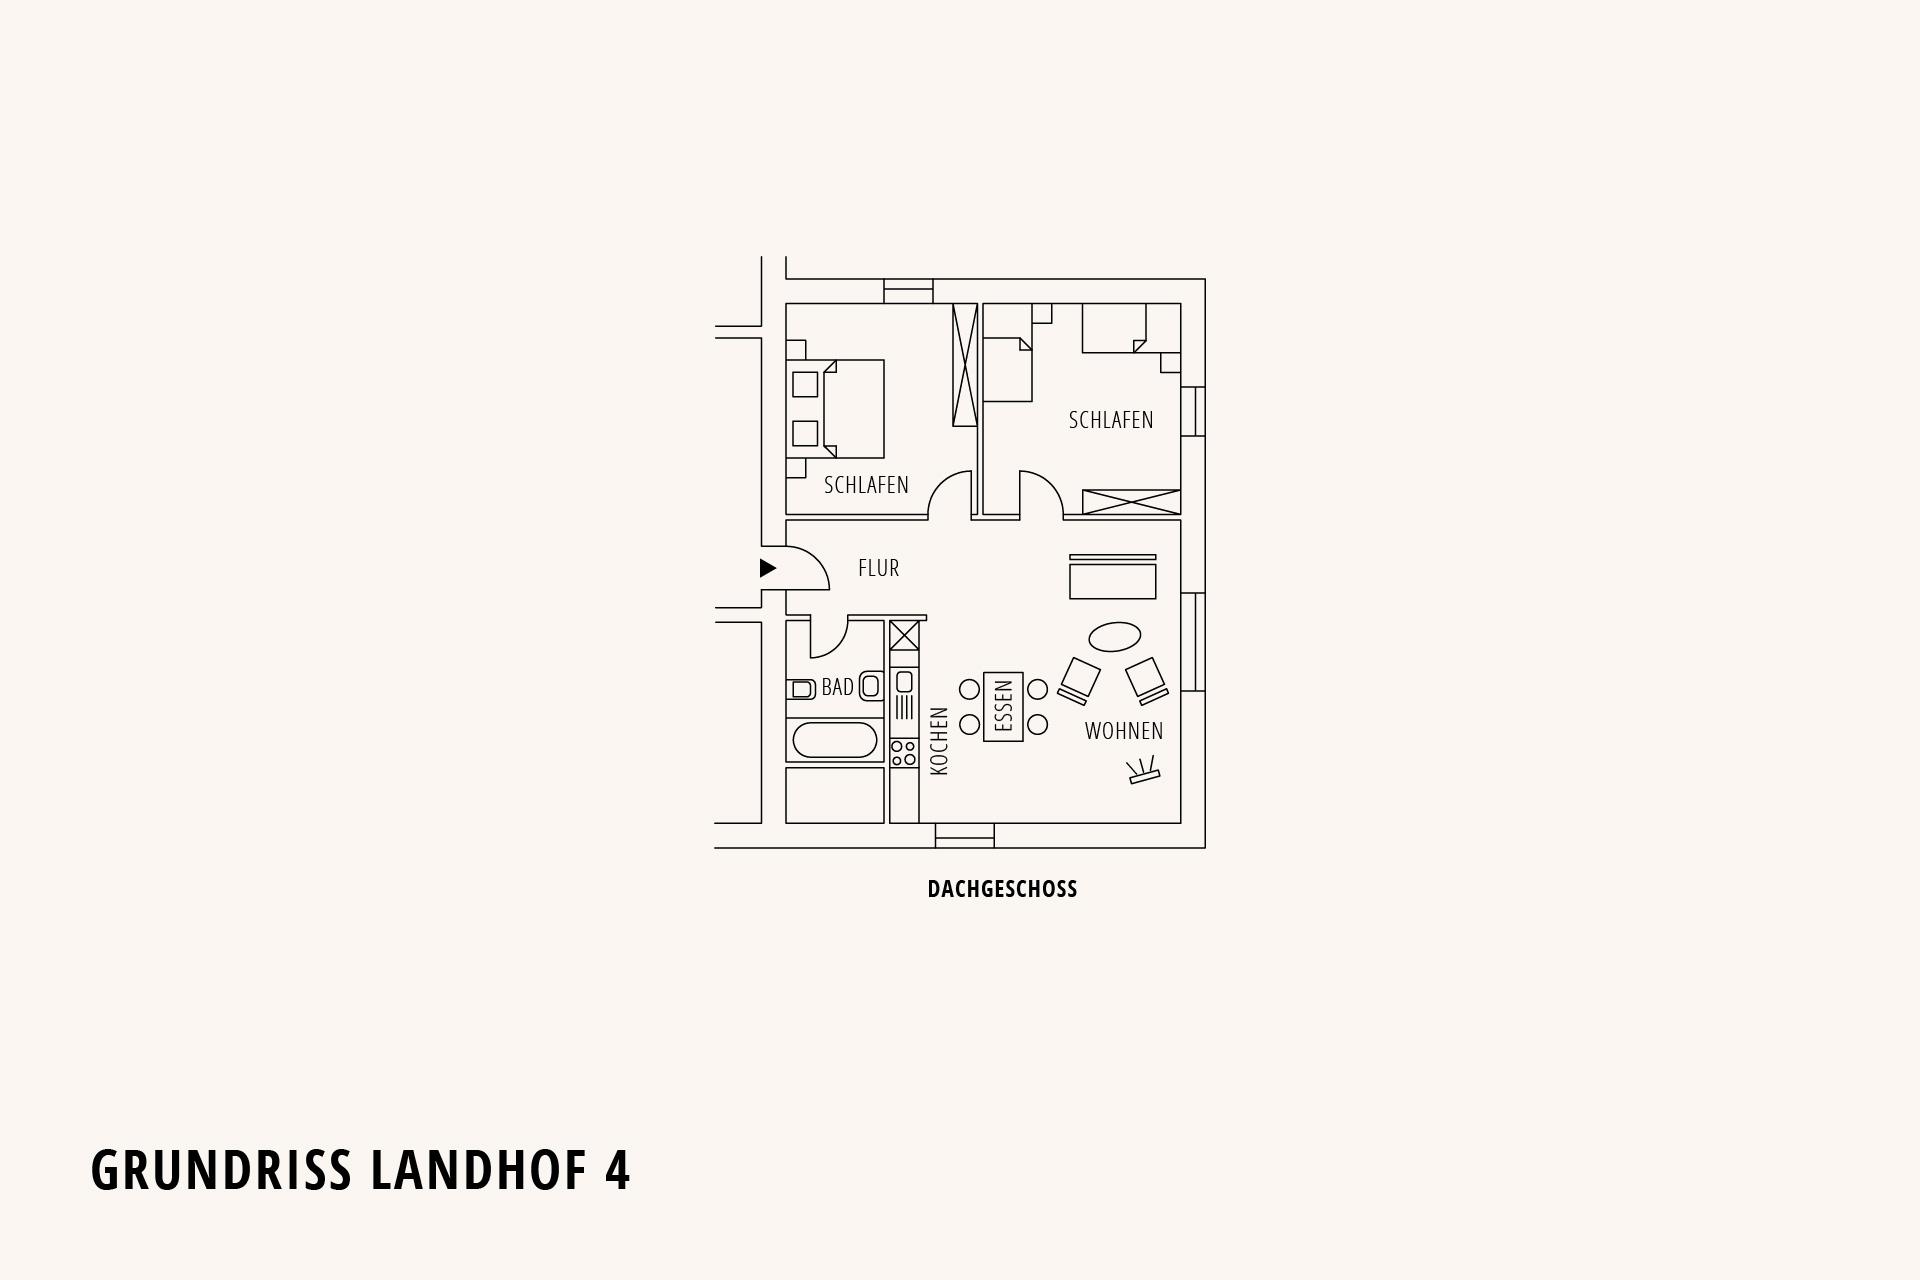 Landhof_4_Grundriss